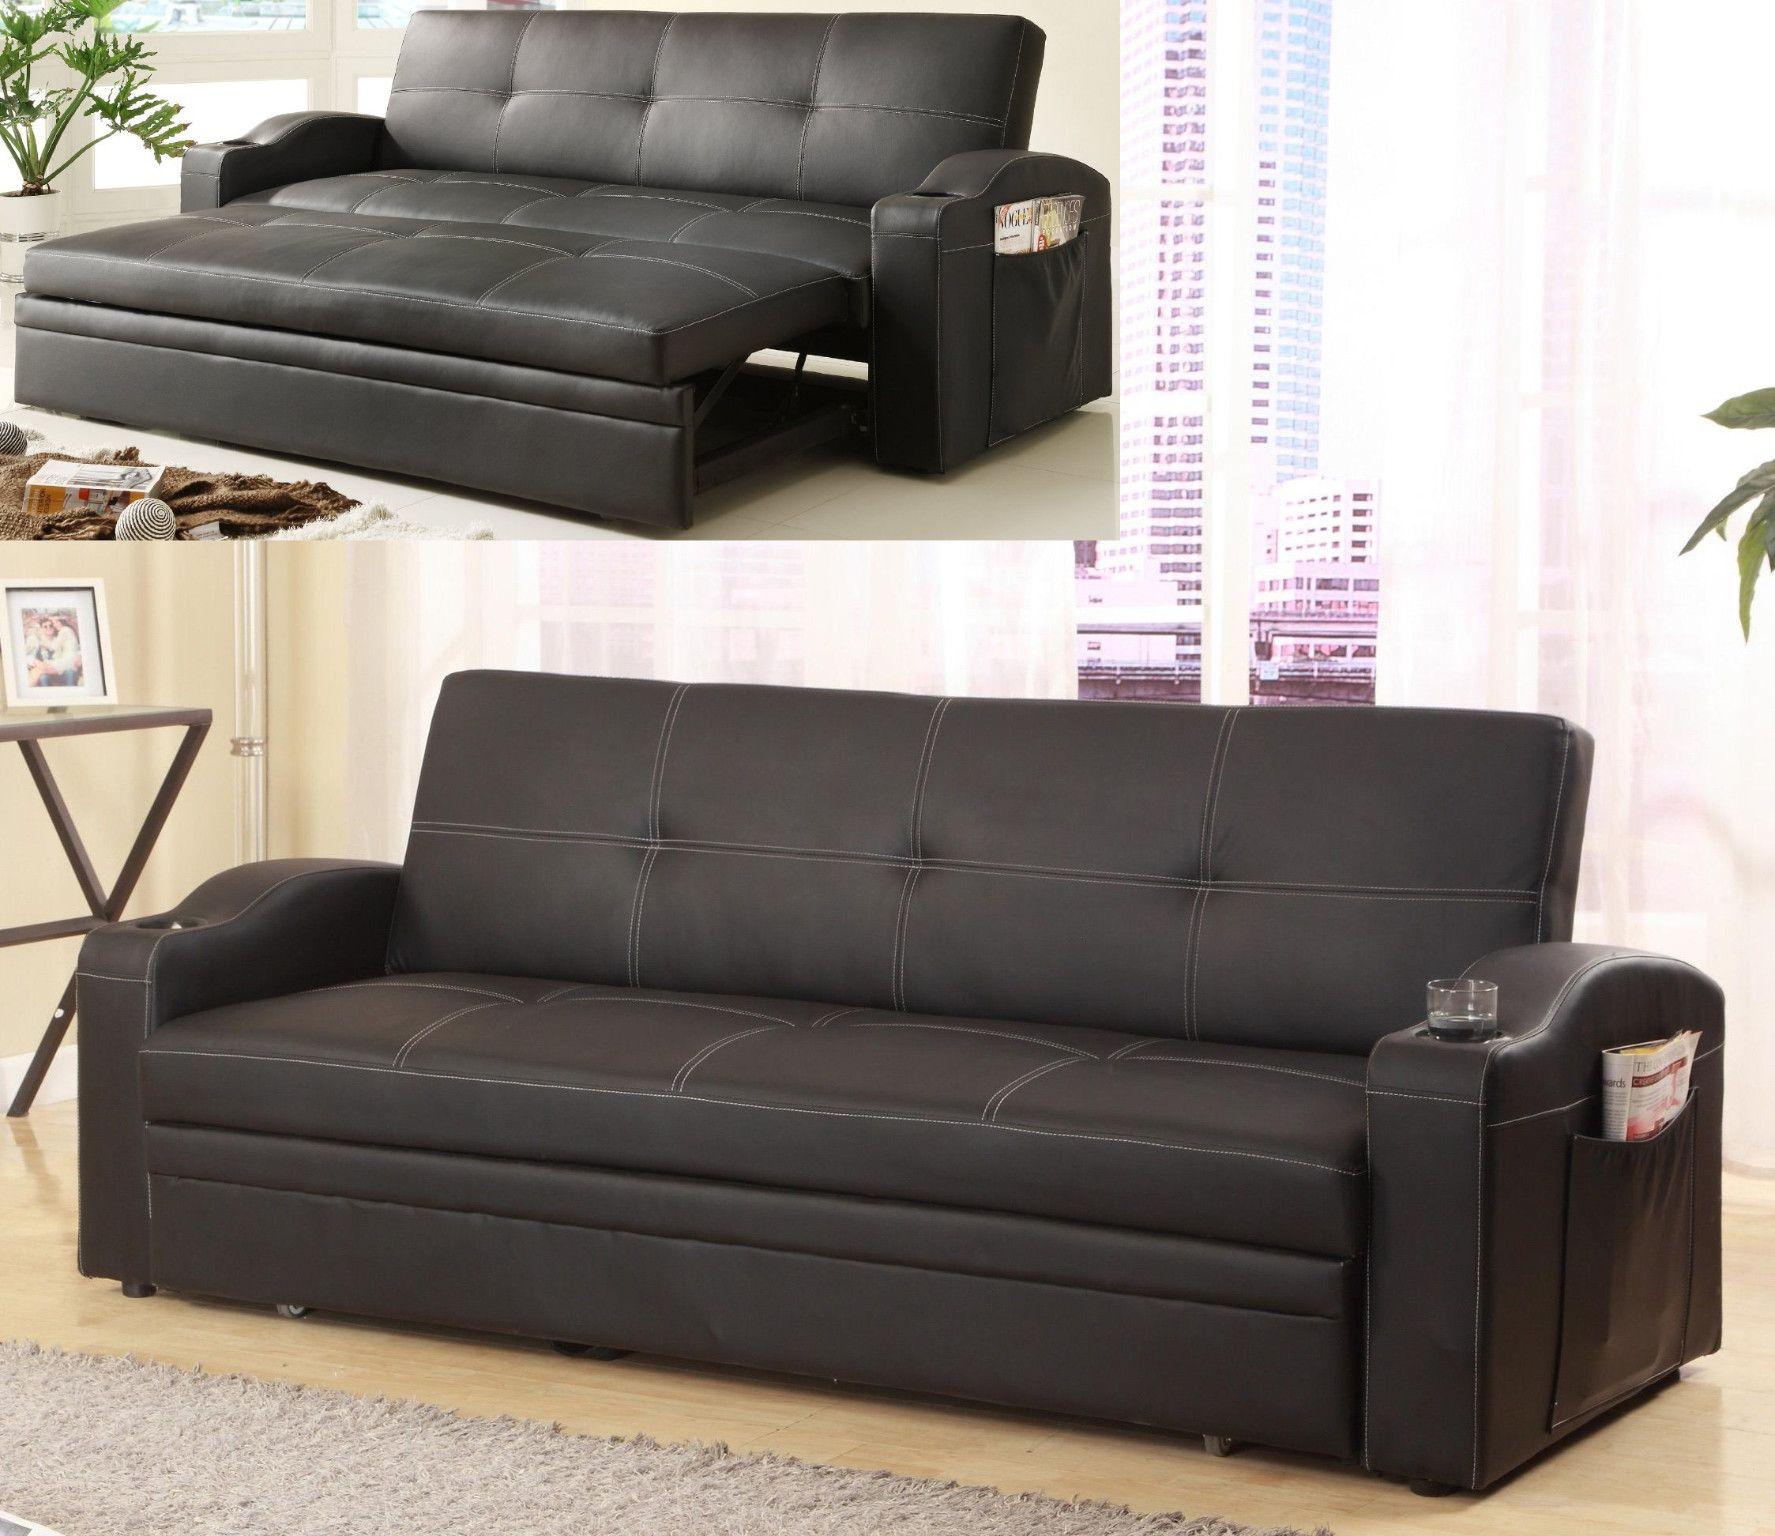 light cfm product sertadreamconvertiblethomassofalightbrown brown dream sofa hayneedle convertible thomas inuse sleeper serta